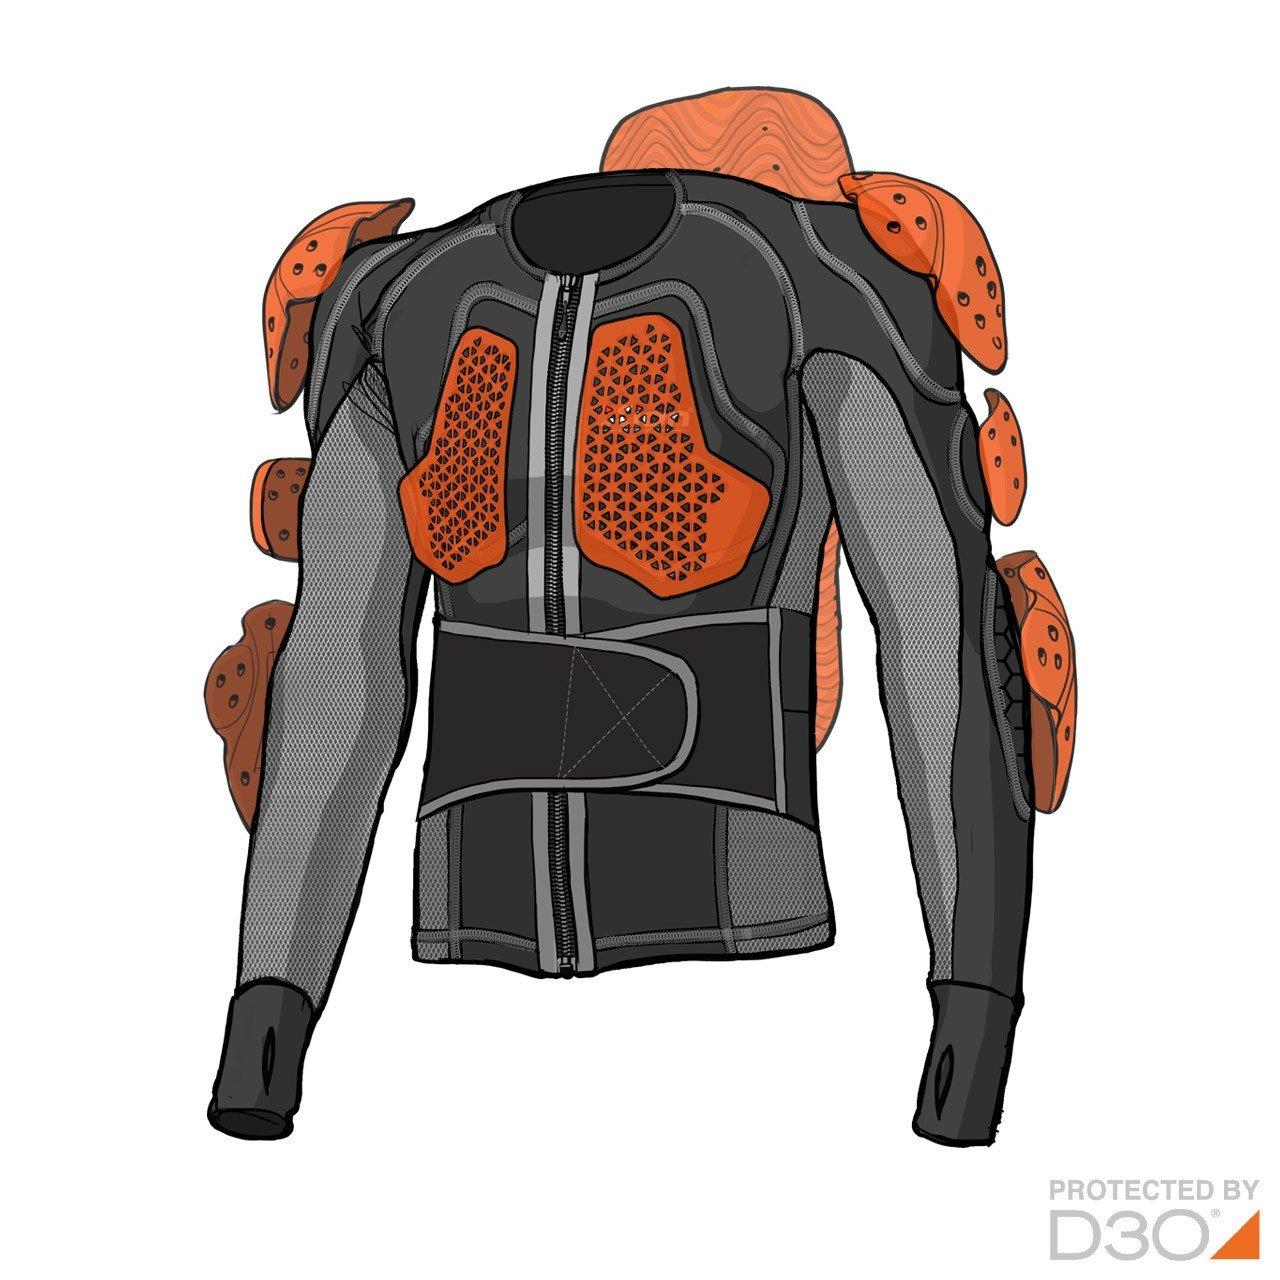 3510a73b11b Xion Protective Gear - XION Protective Gear